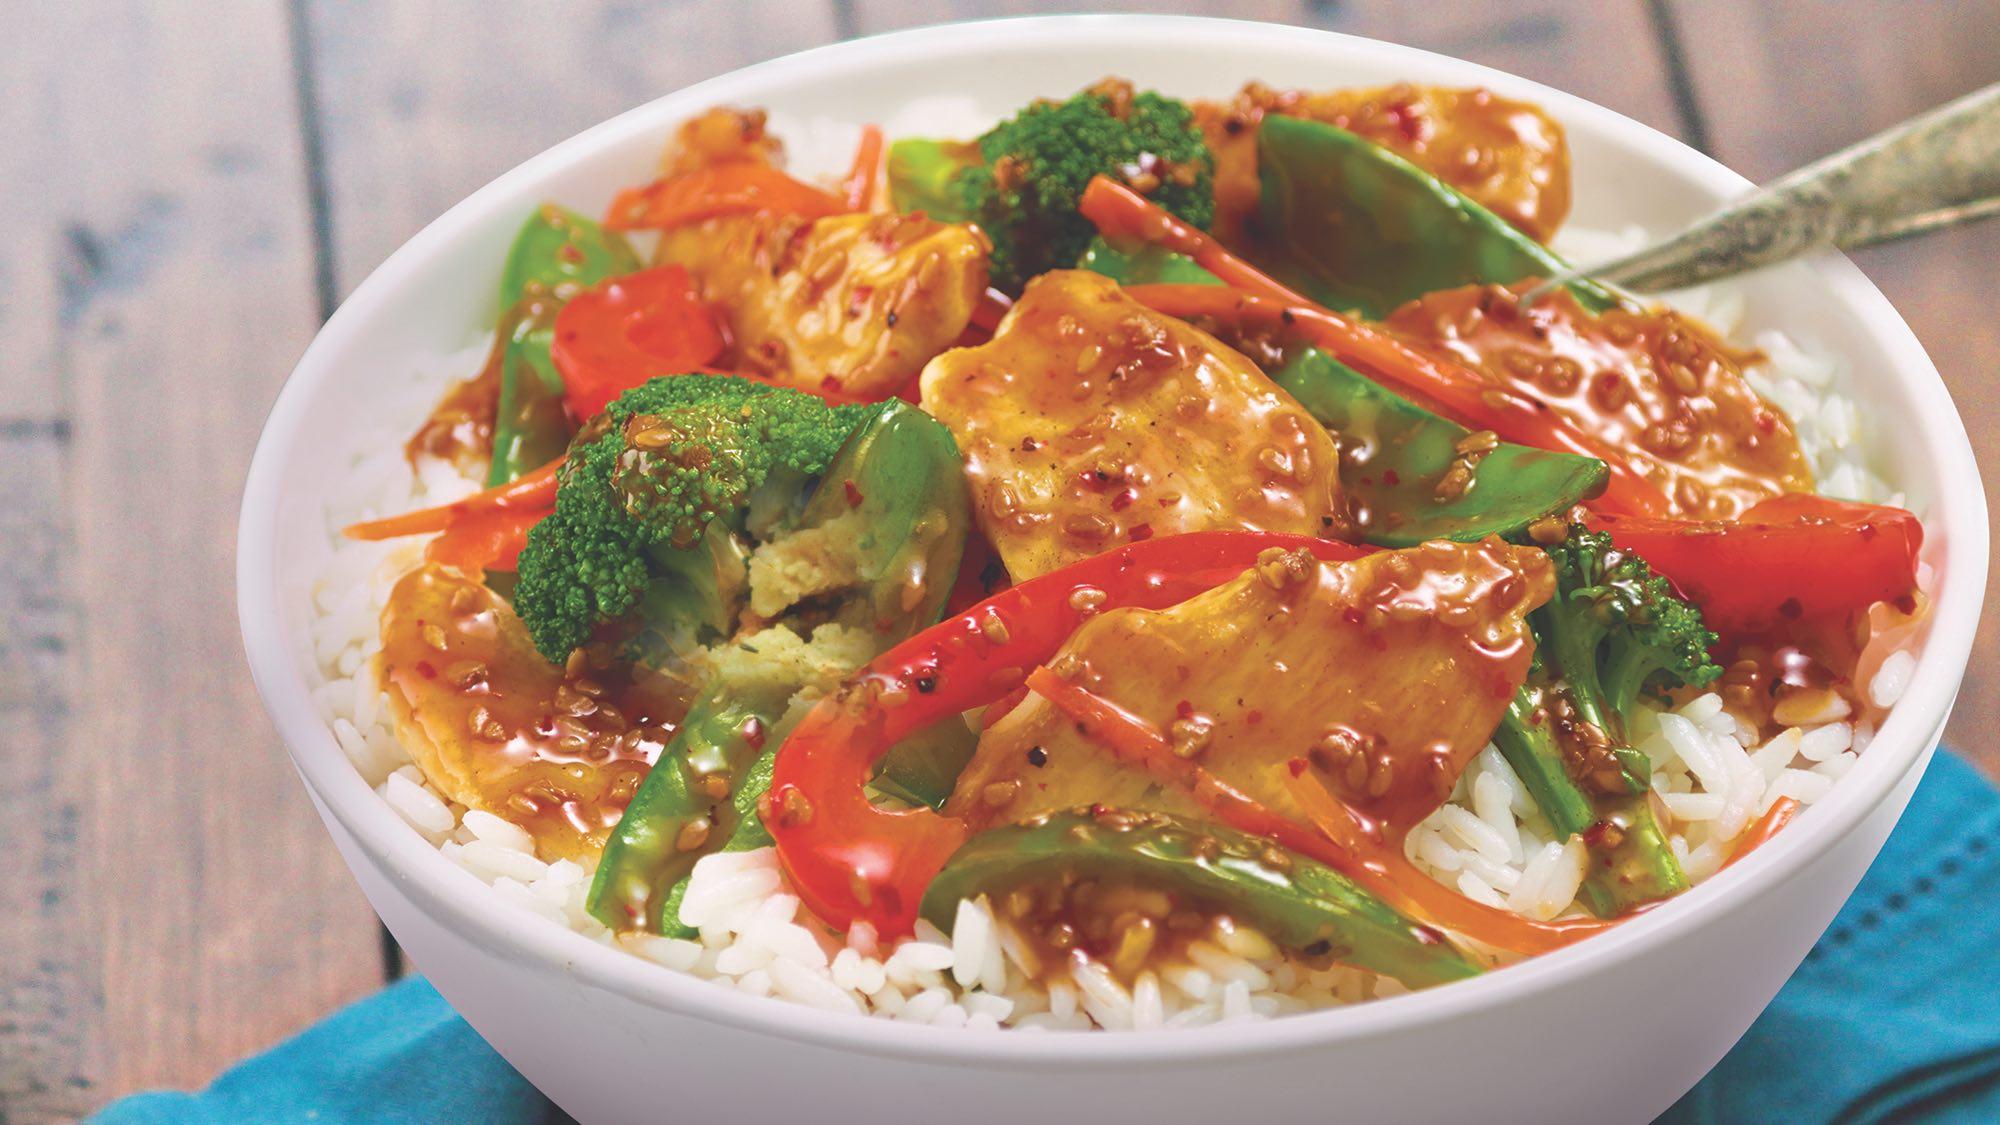 sesame-chicken-stir-fry.jpg